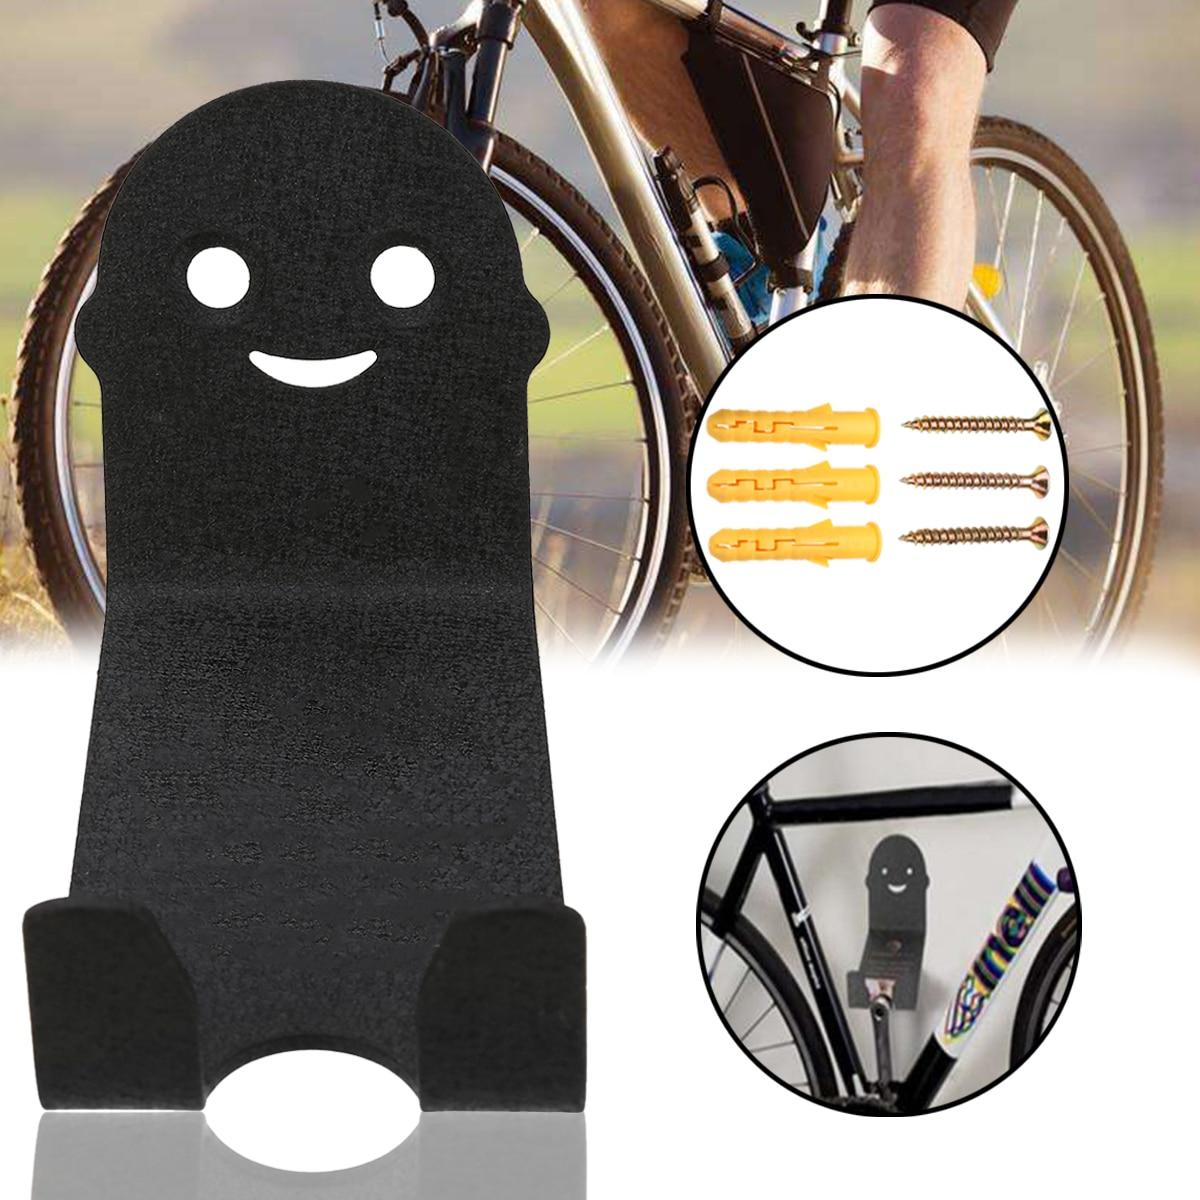 2Pcs Bike Bicycle Cycling Pedal Tire Wall Mount Storage Hanger Stand Rack Black